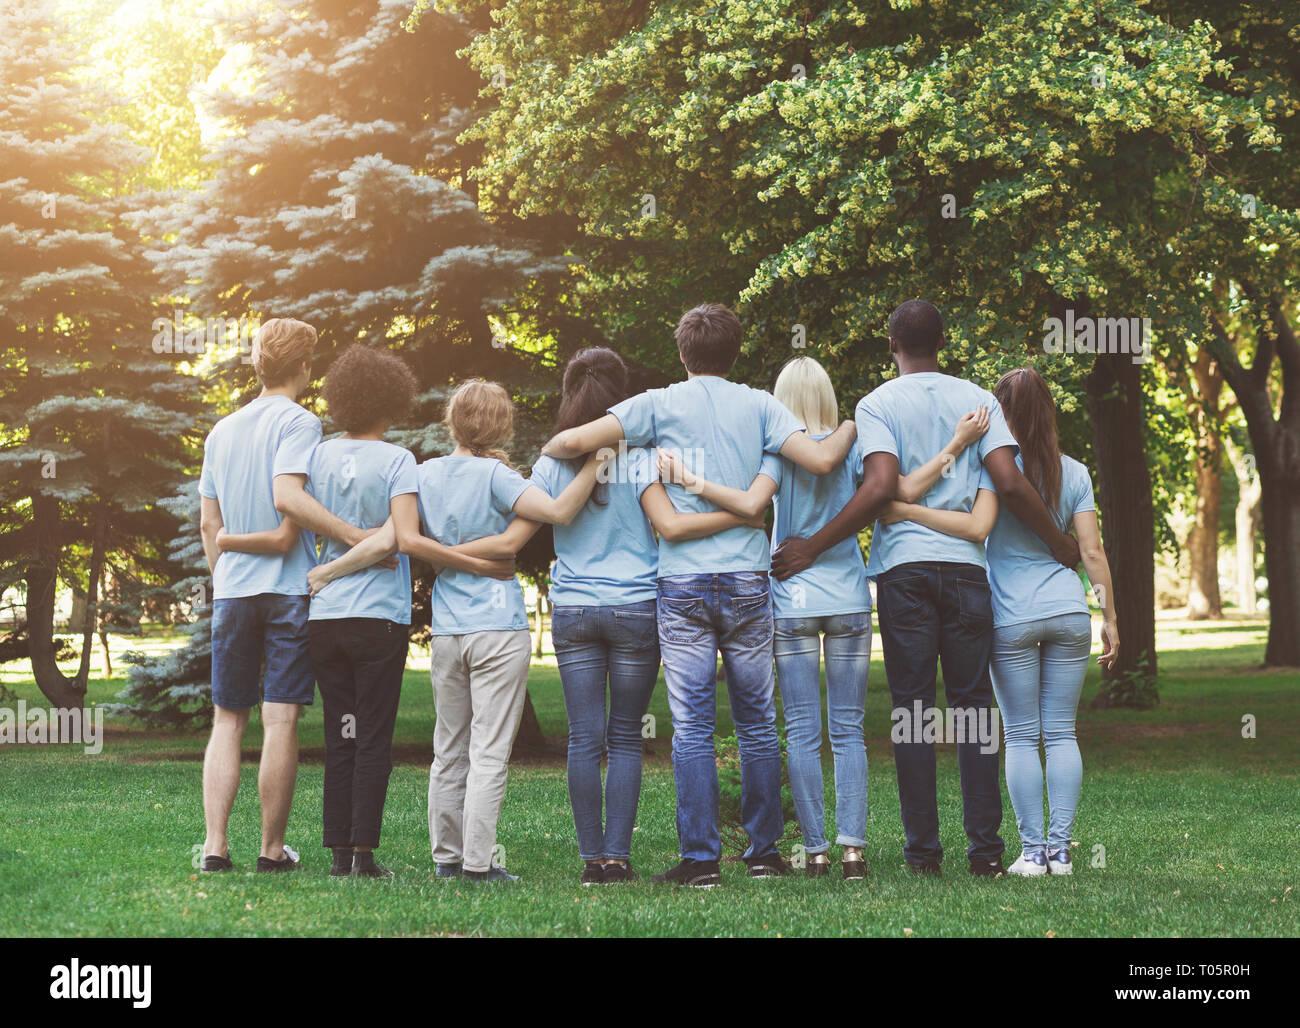 Group of happy volunteers embracing in park - Stock Image